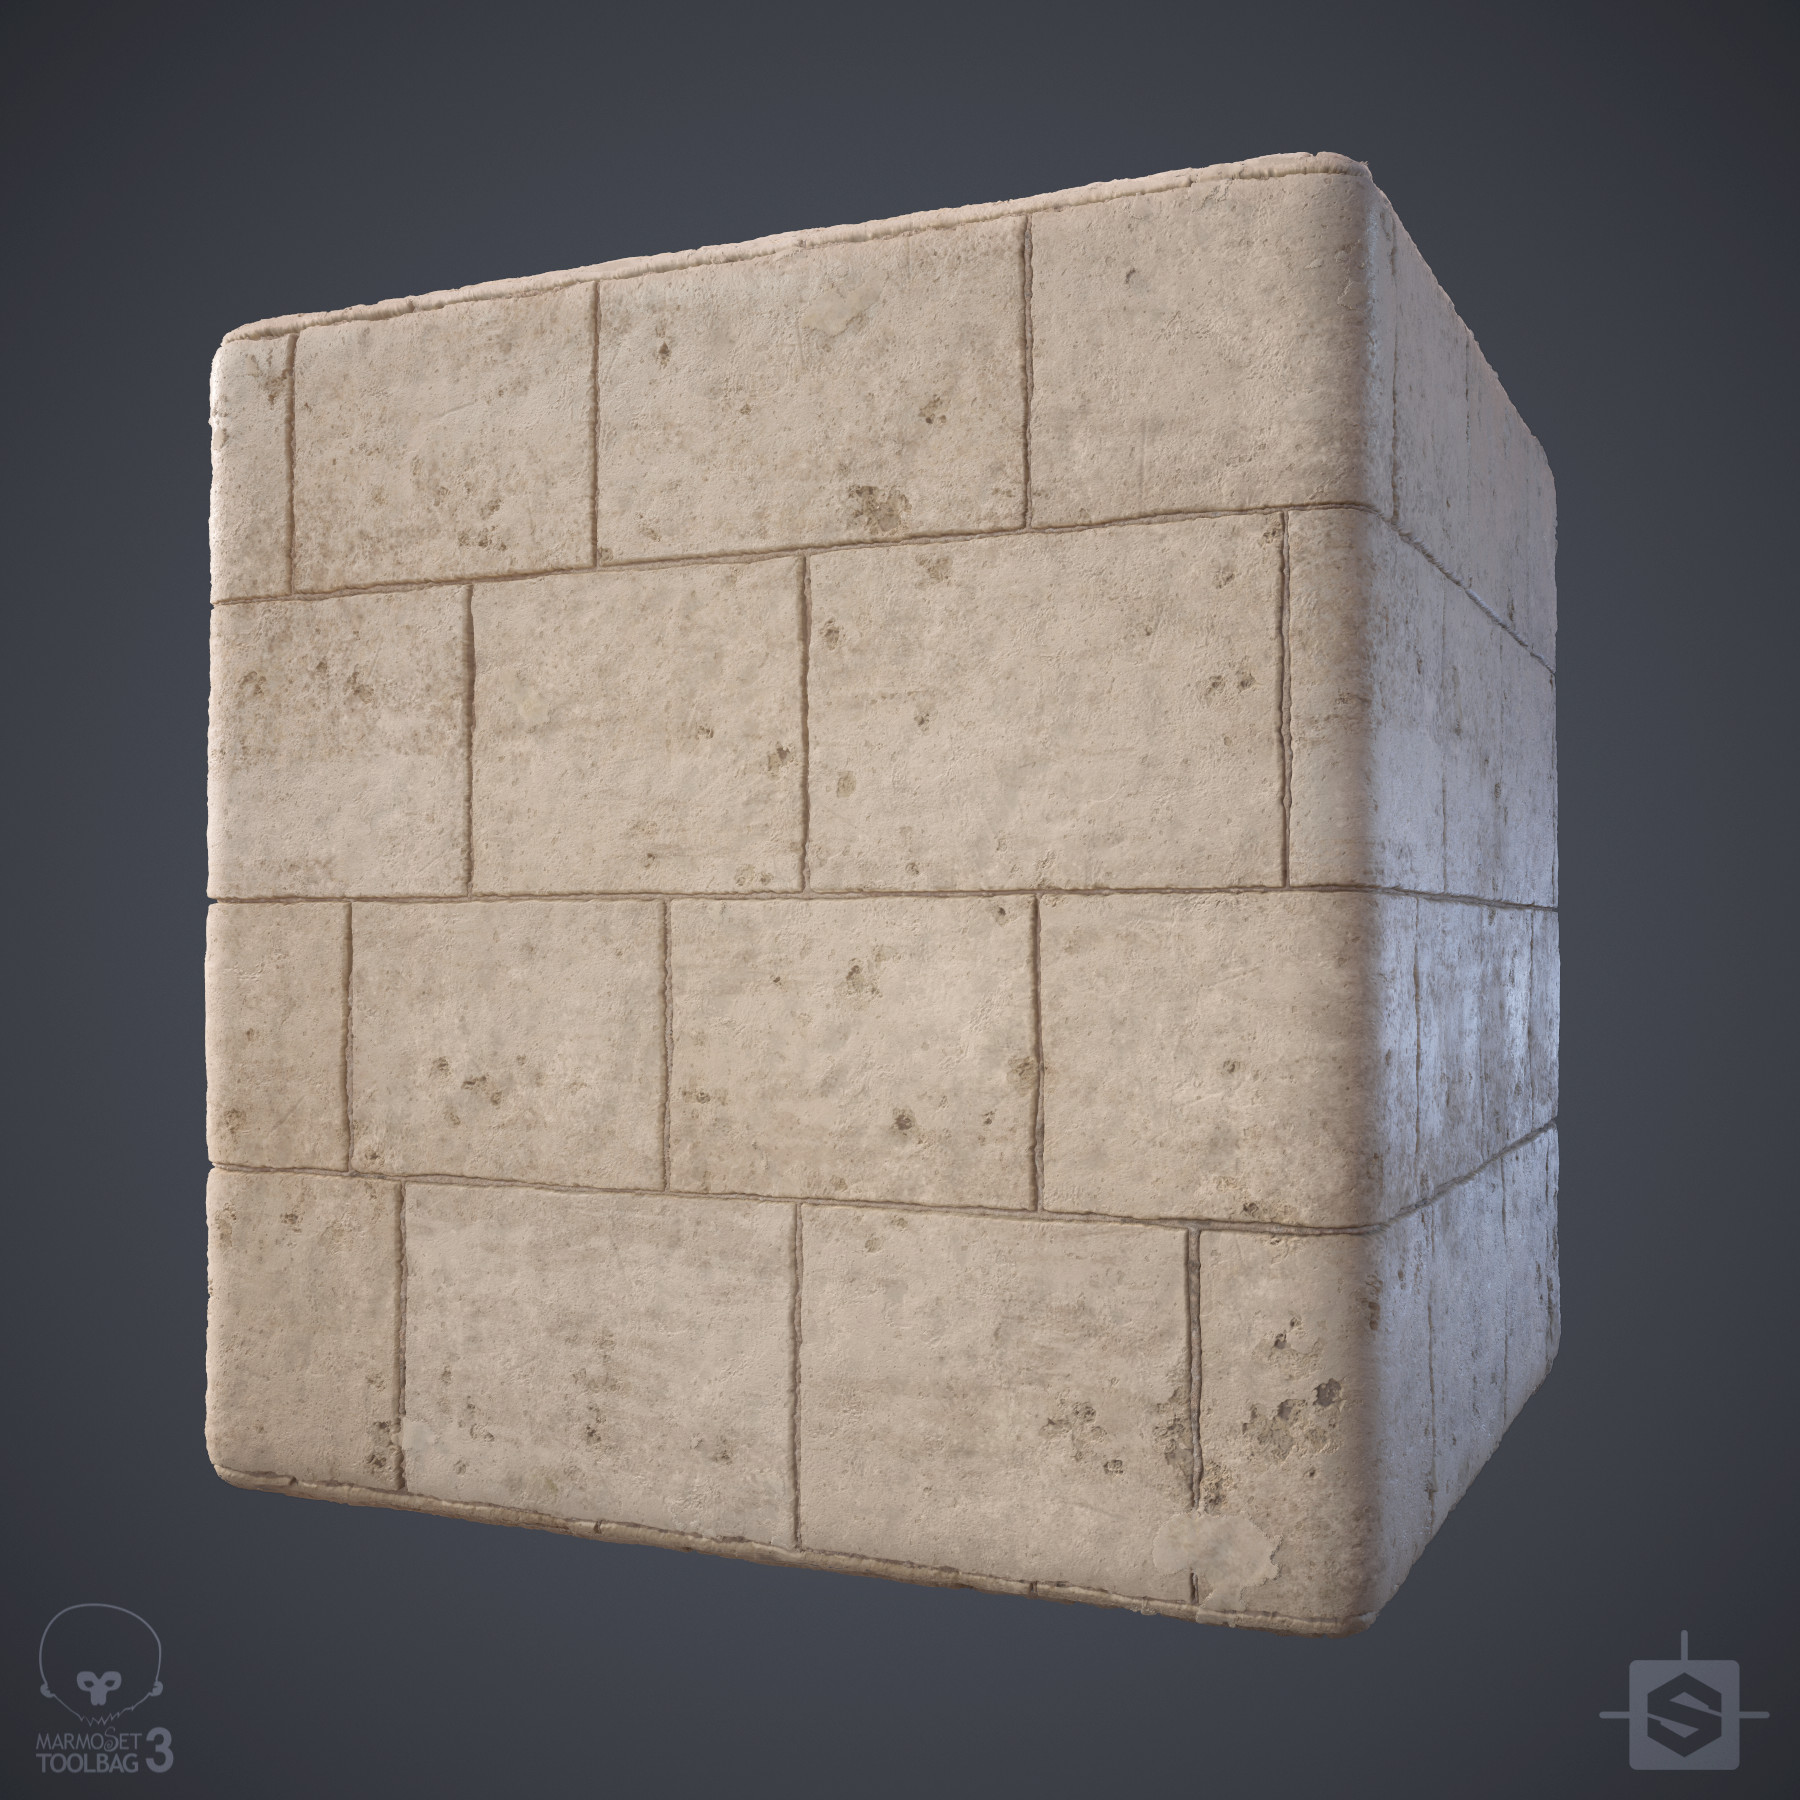 Ryan leslie limestone wall cube 01d